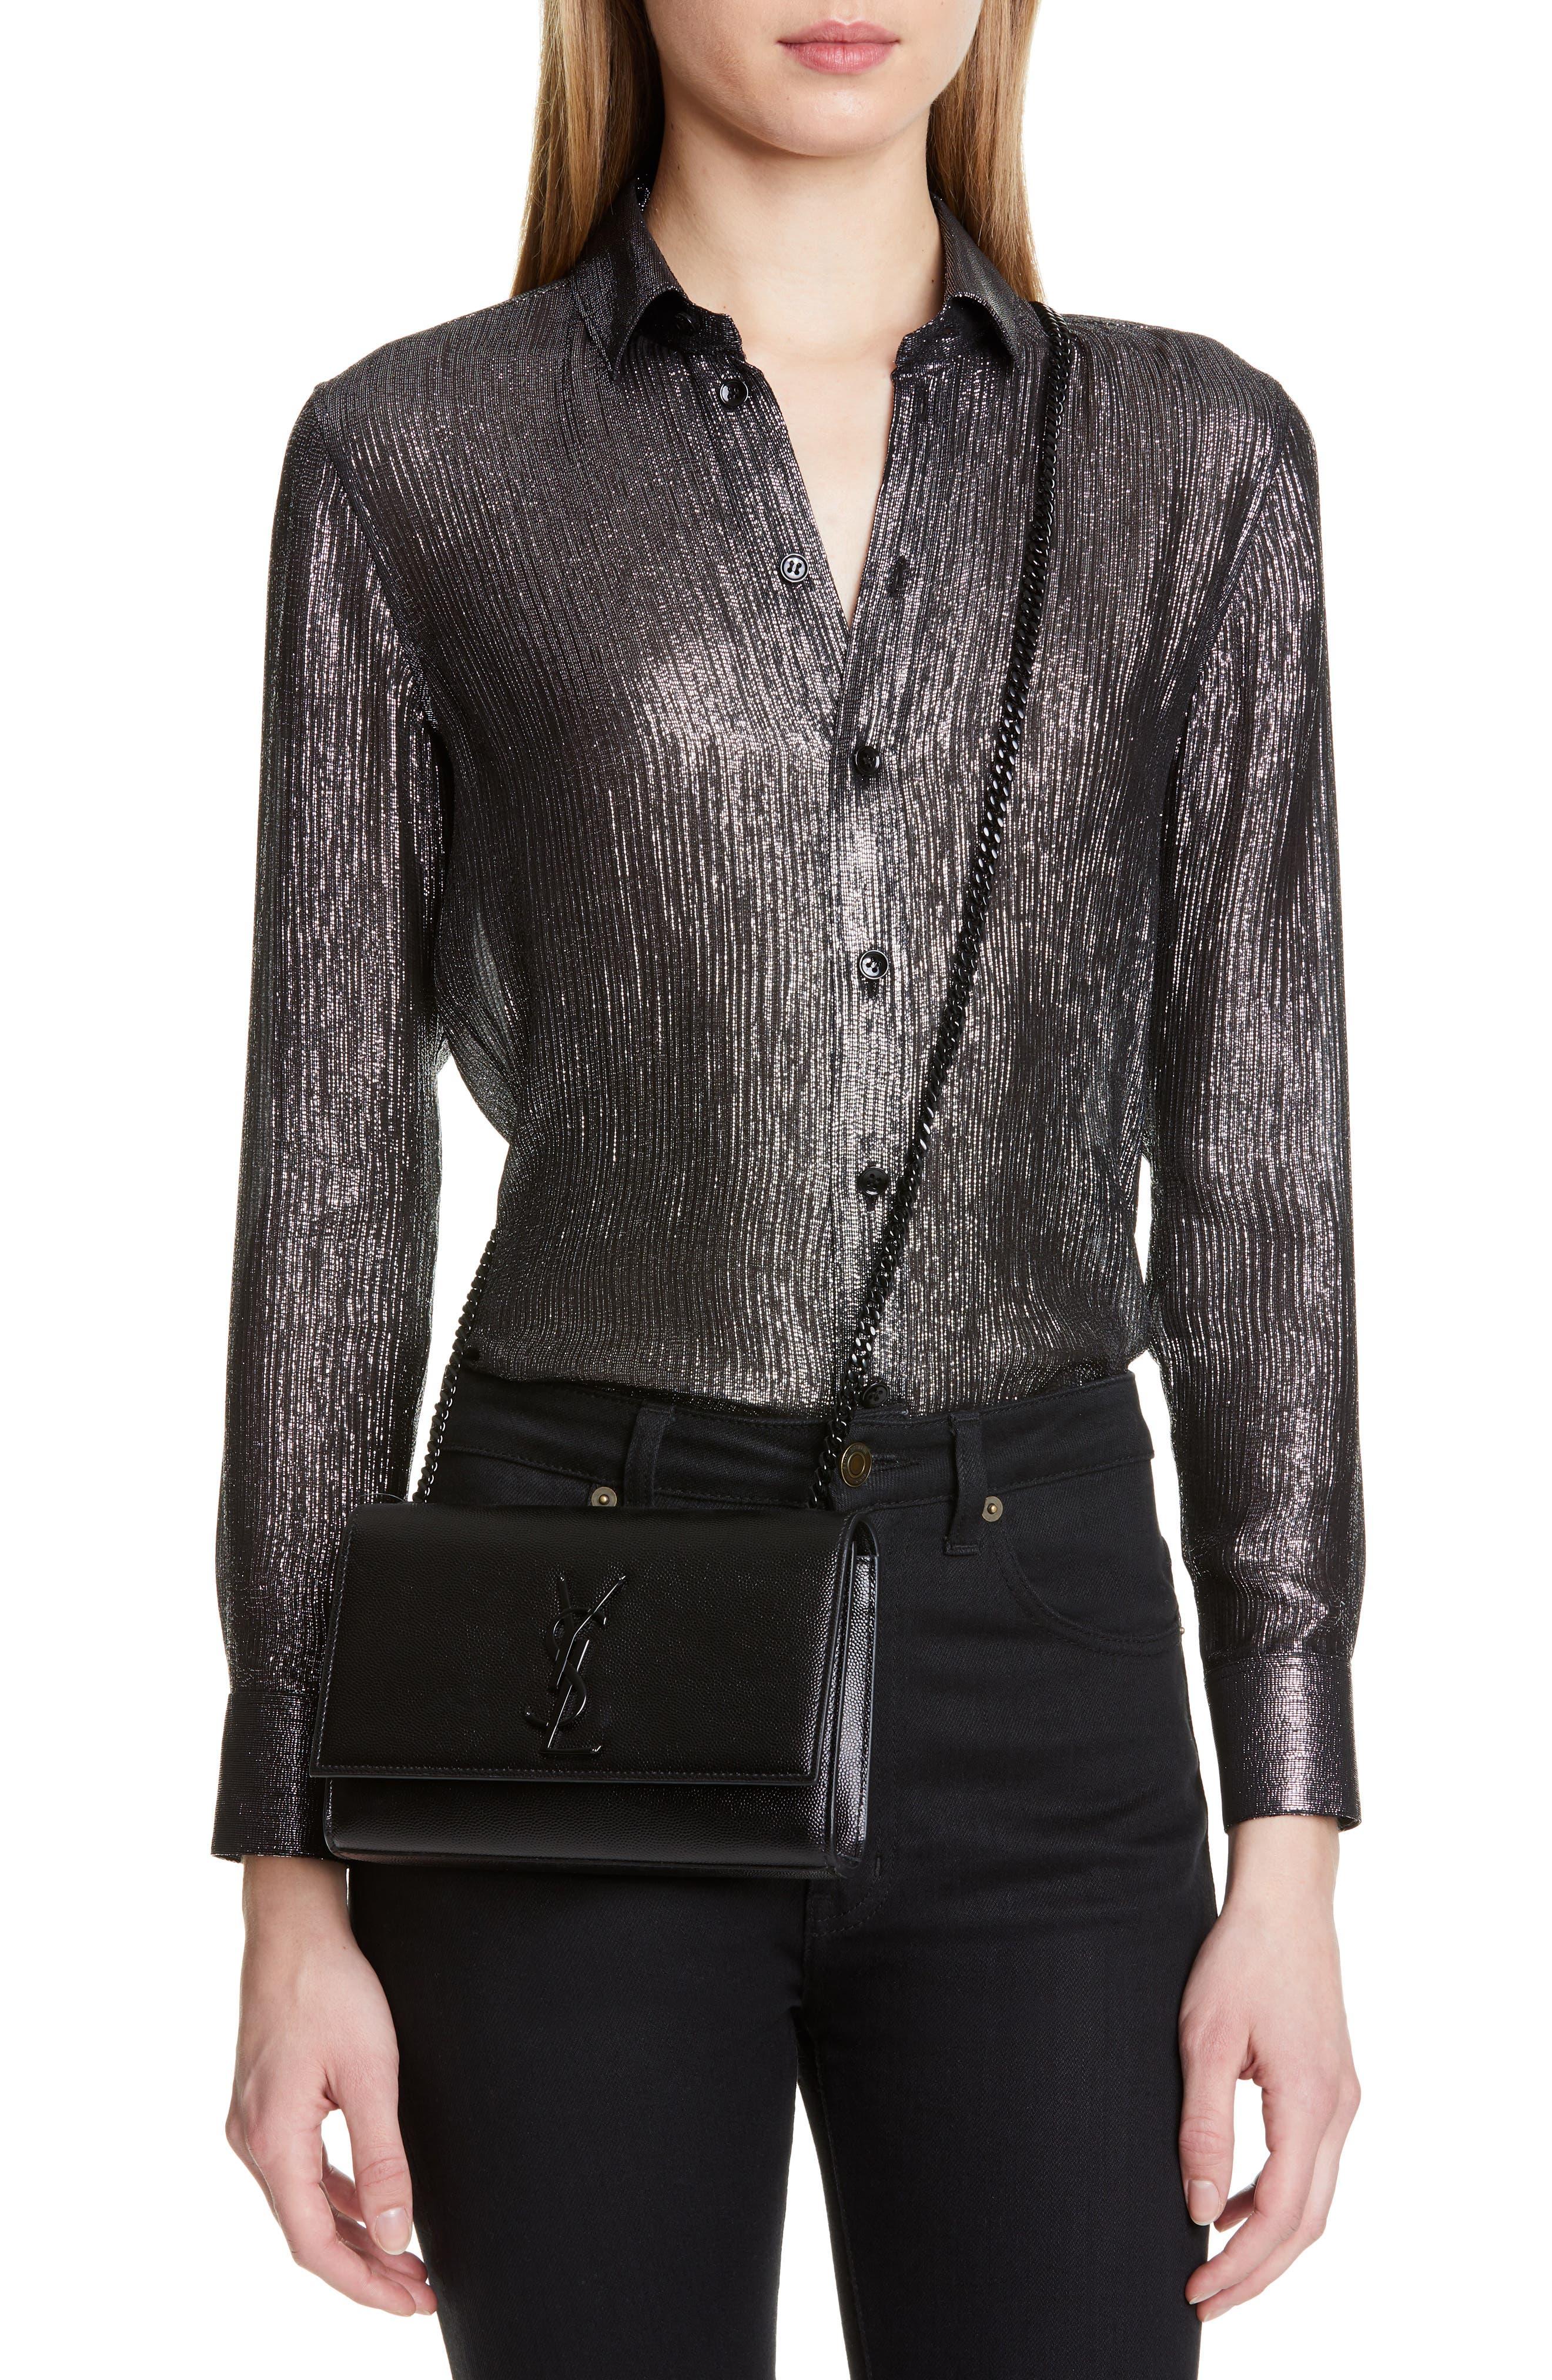 SAINT LAURENT, Small Kate Leather Shoulder Bag, Alternate thumbnail 2, color, BLACK